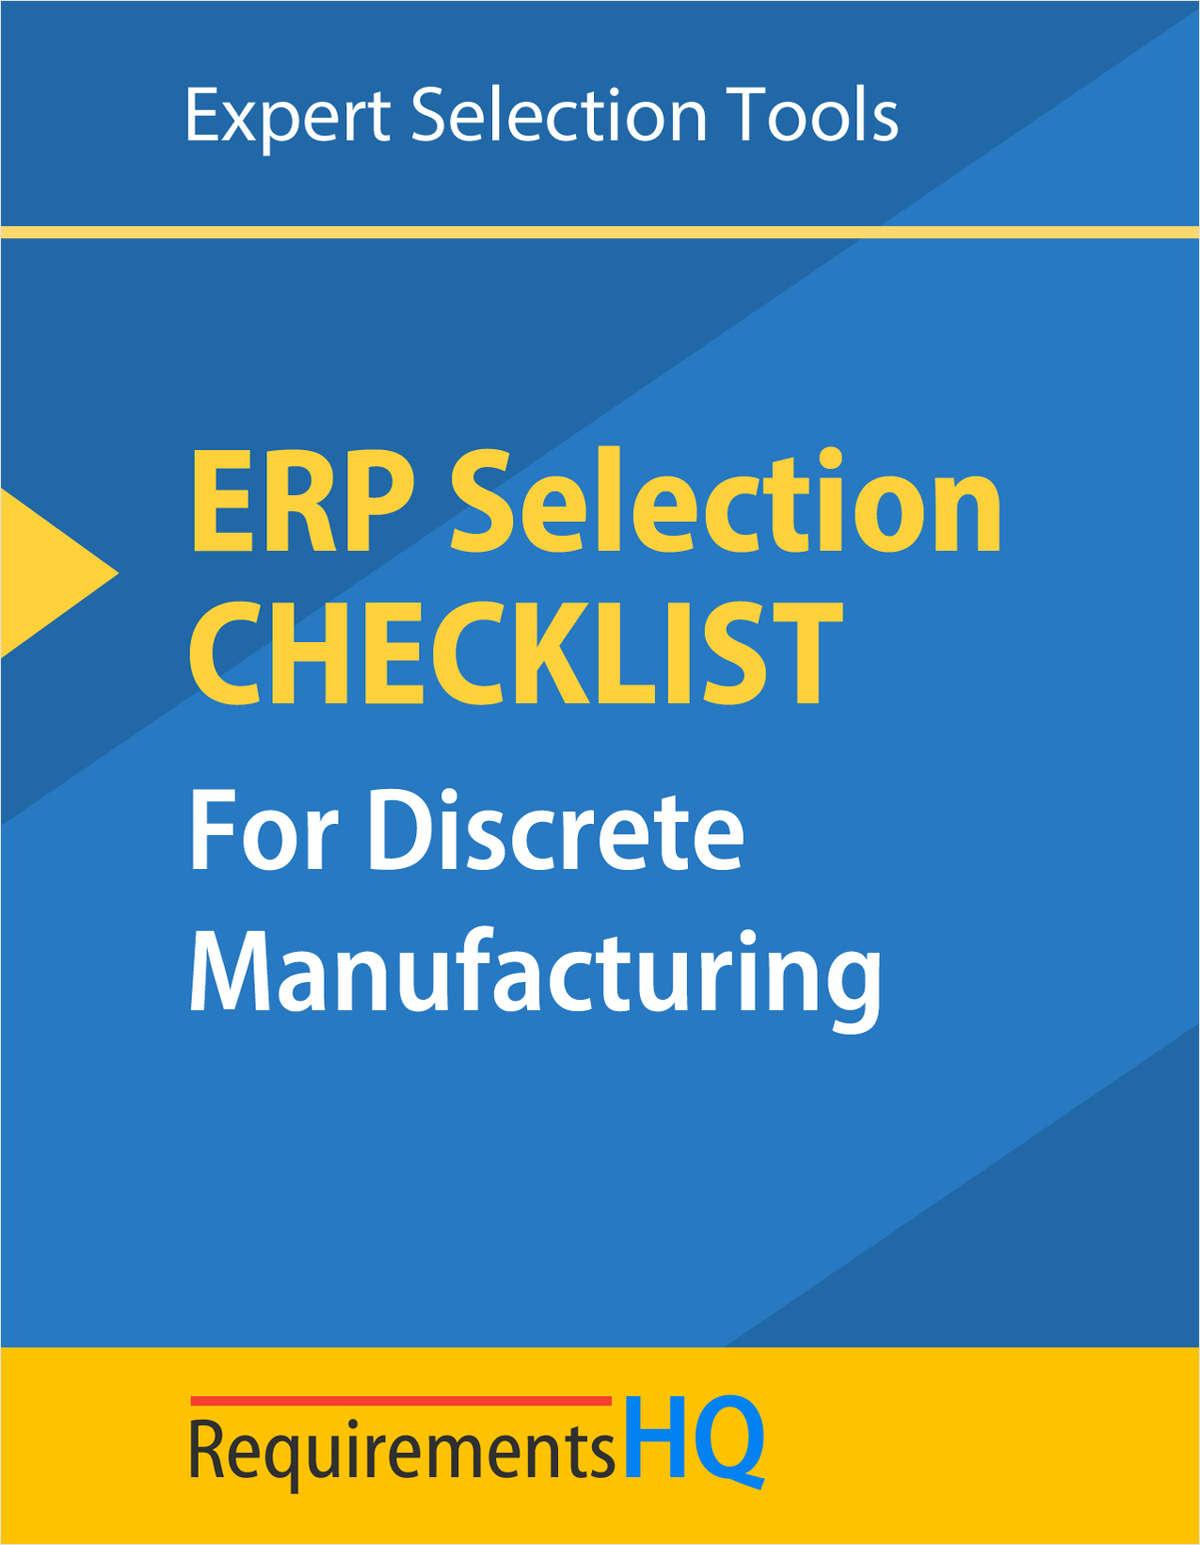 Discrete Manufacturing ERP Selection Checklist 2020